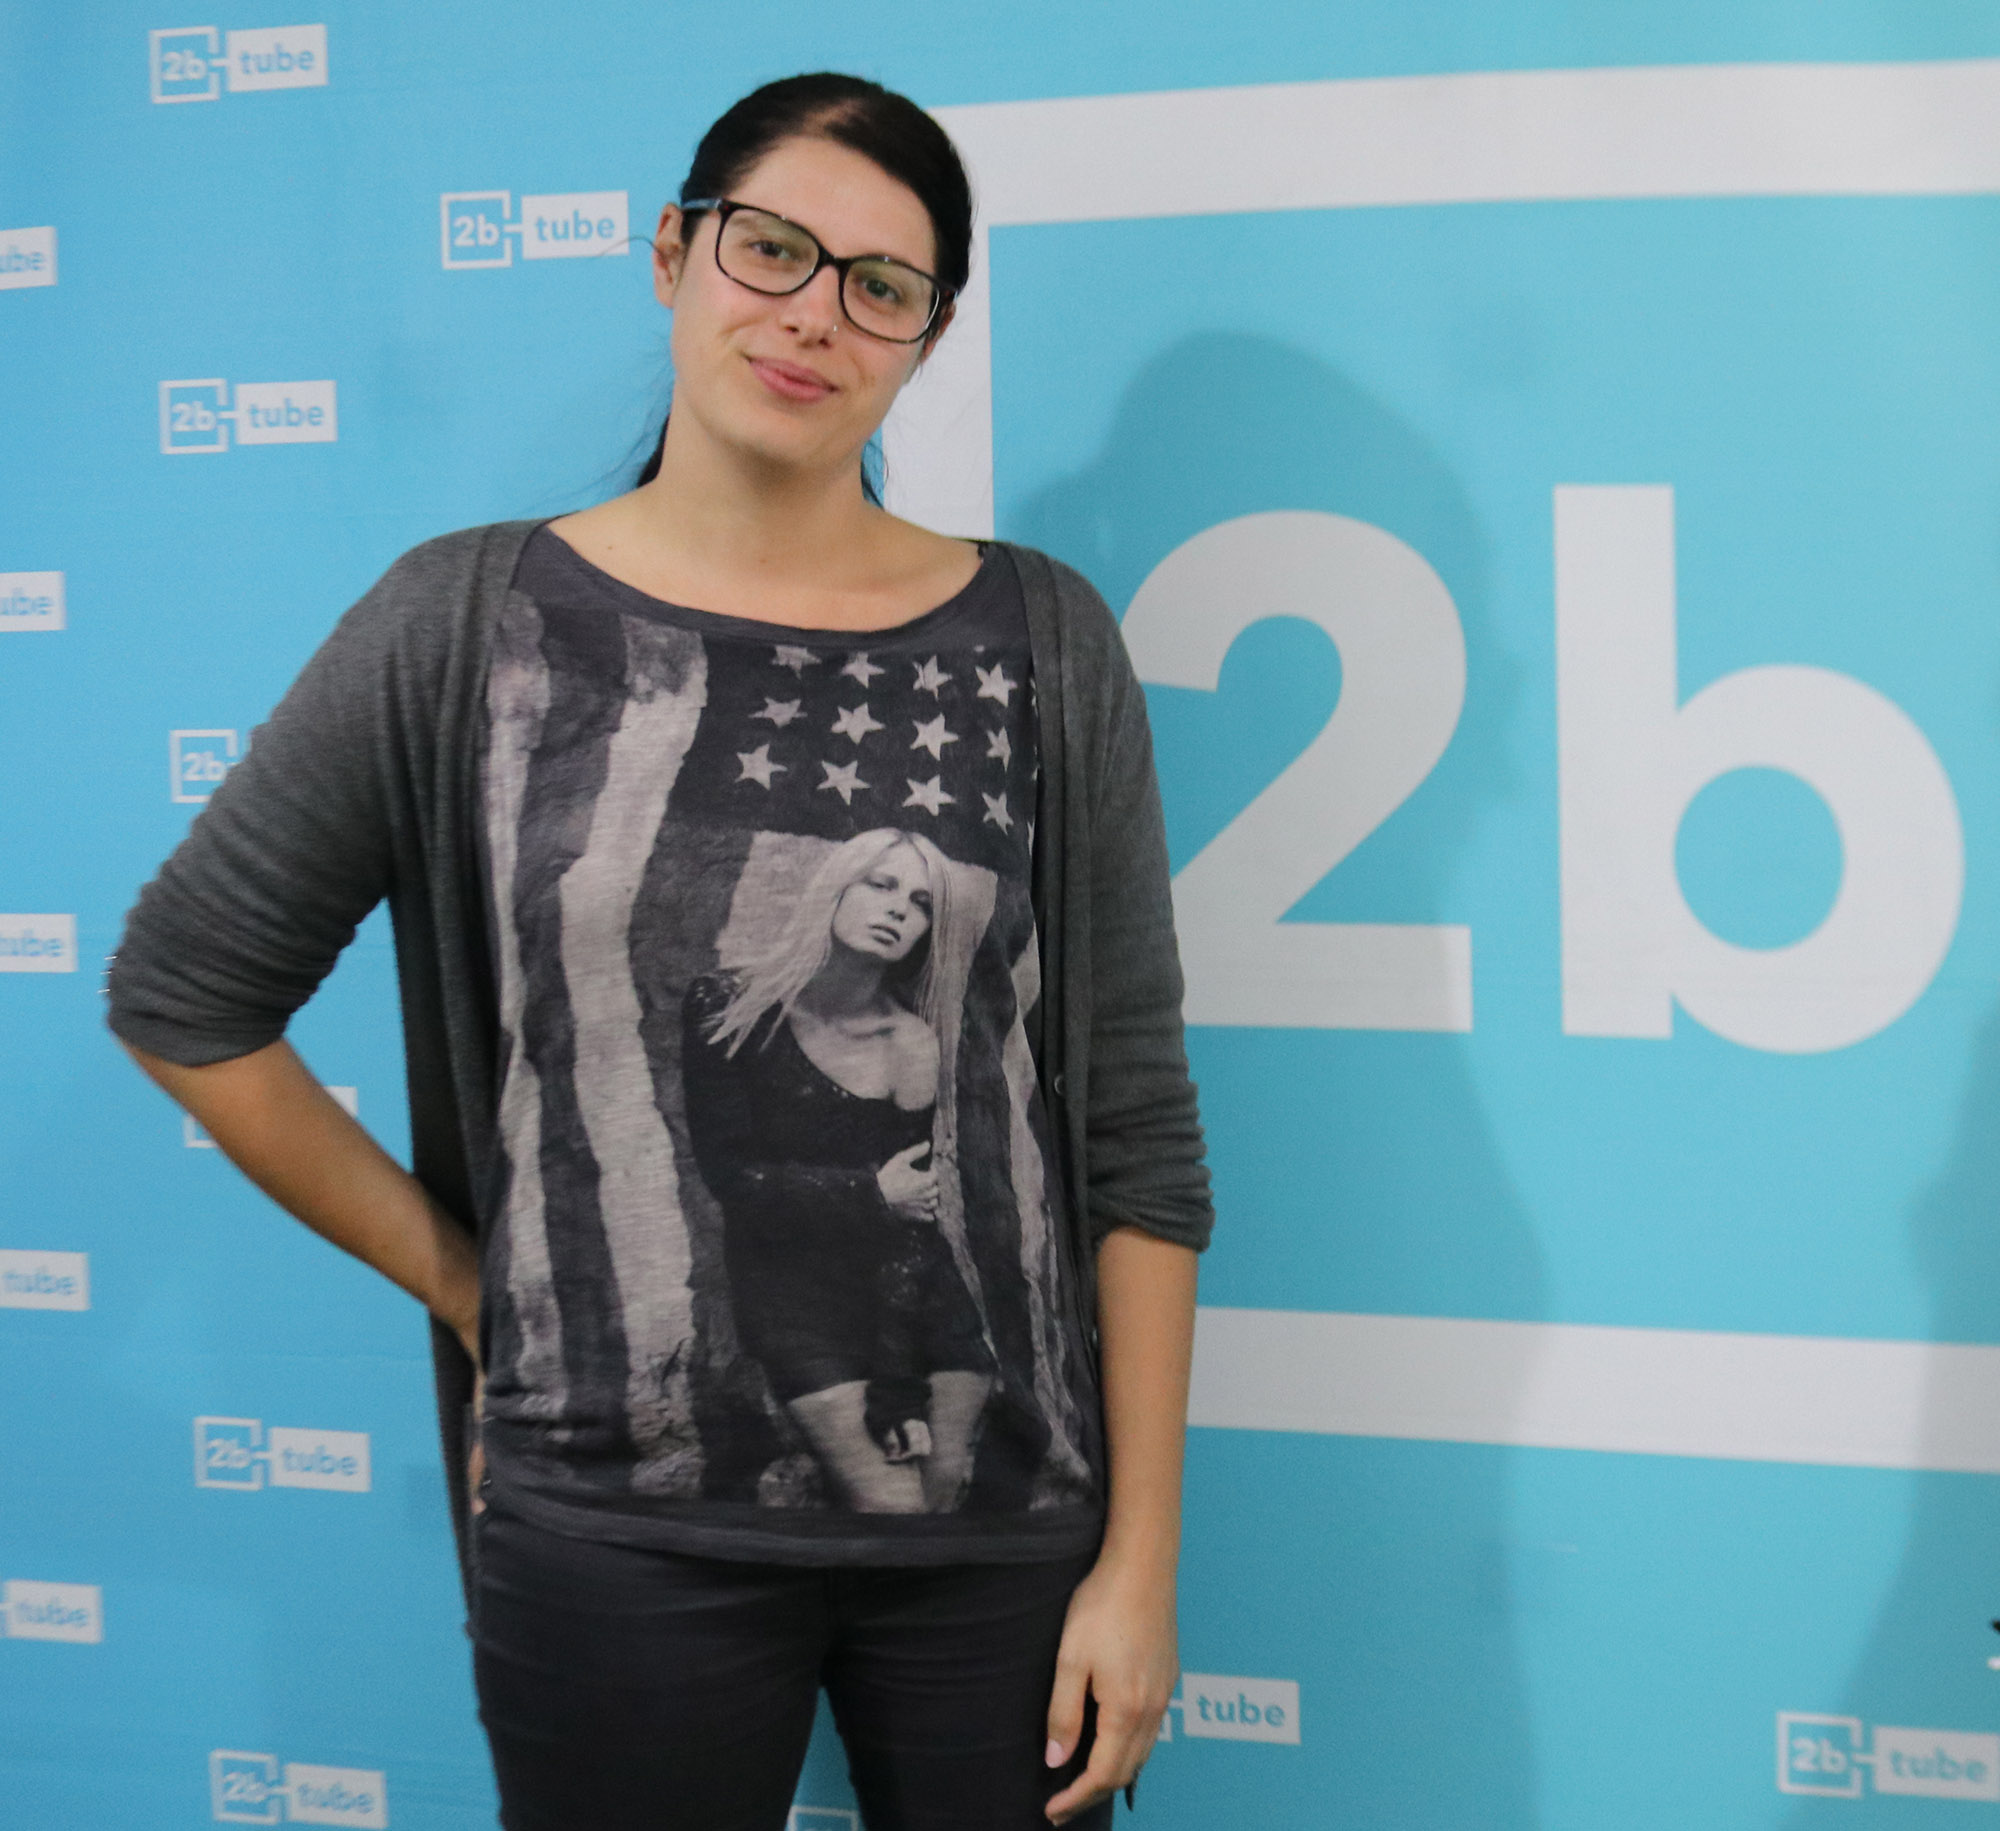 Patricia Gonzalez, directora de Marketing de 2b-tube